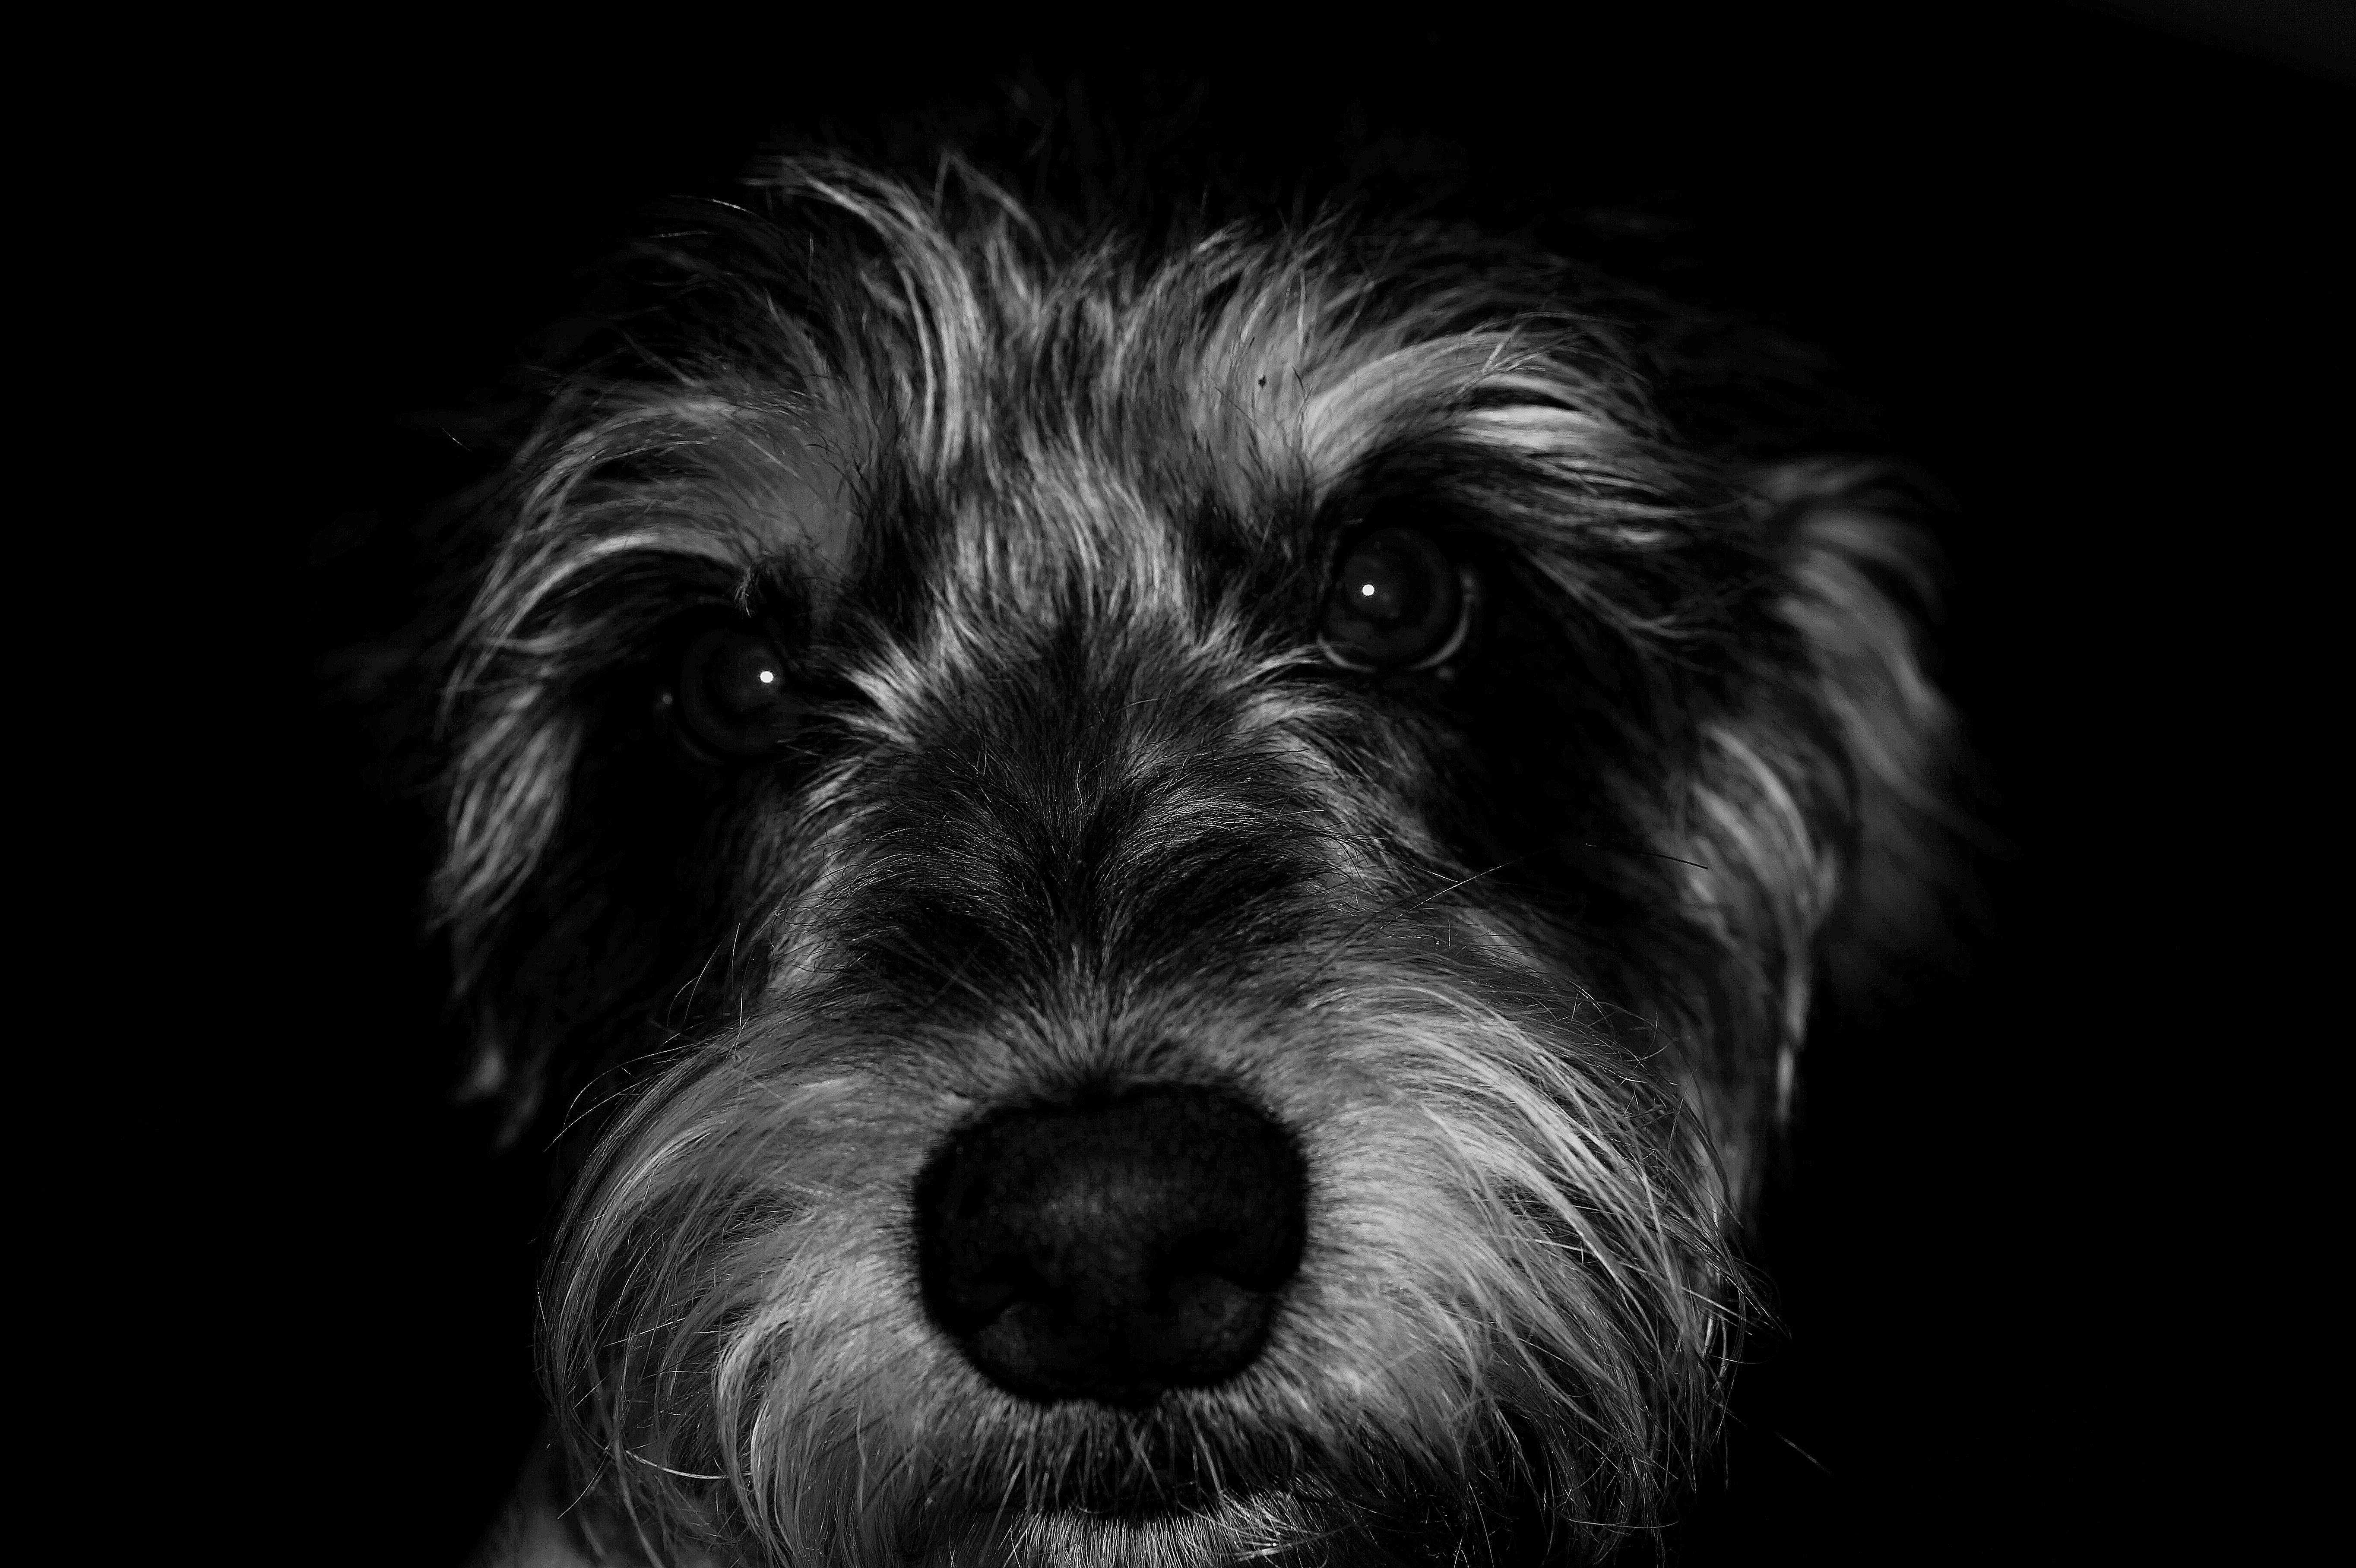 animal, animal photography, black-and-white